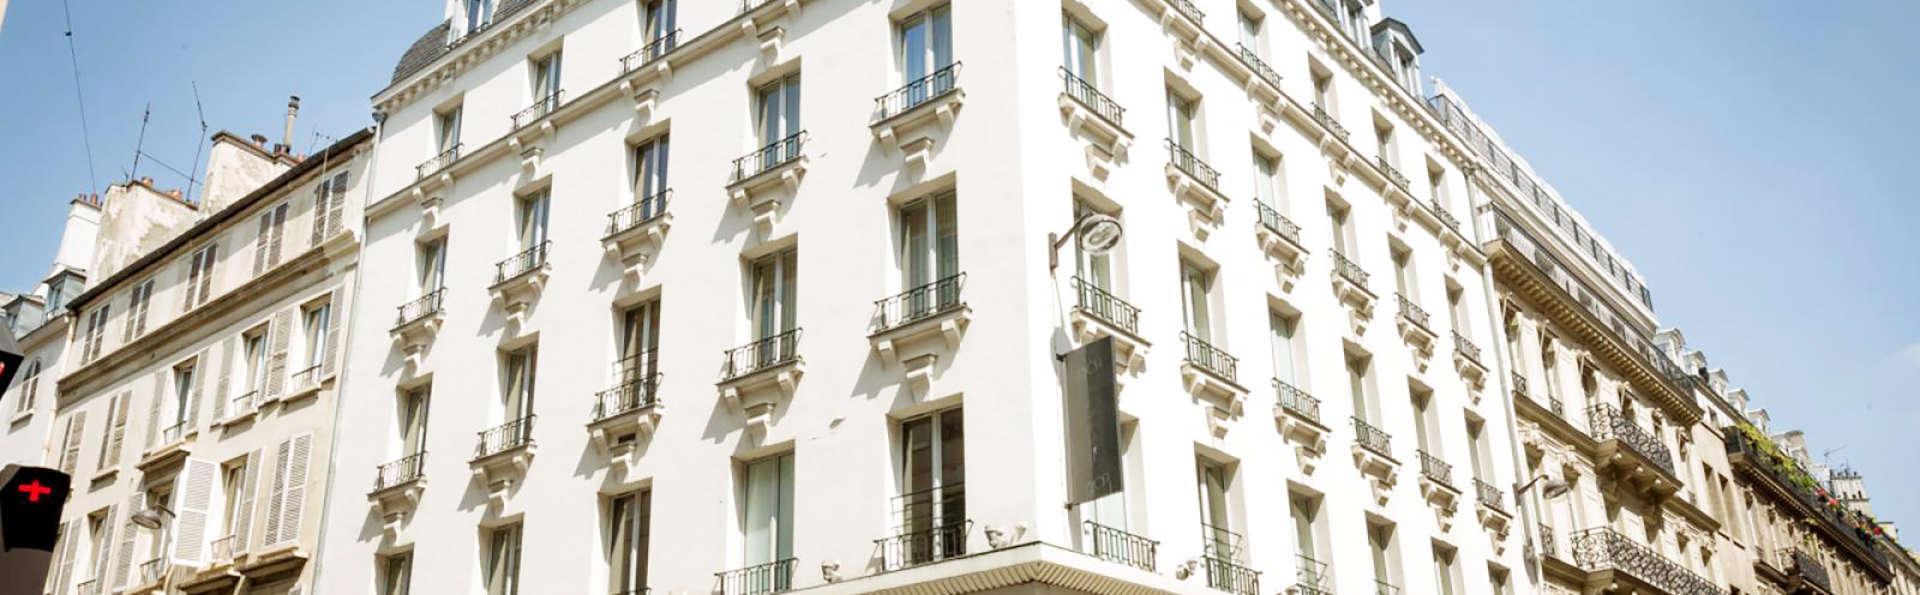 Hôtel du Triangle d'Or - EDIT-Fachada-1.jpg